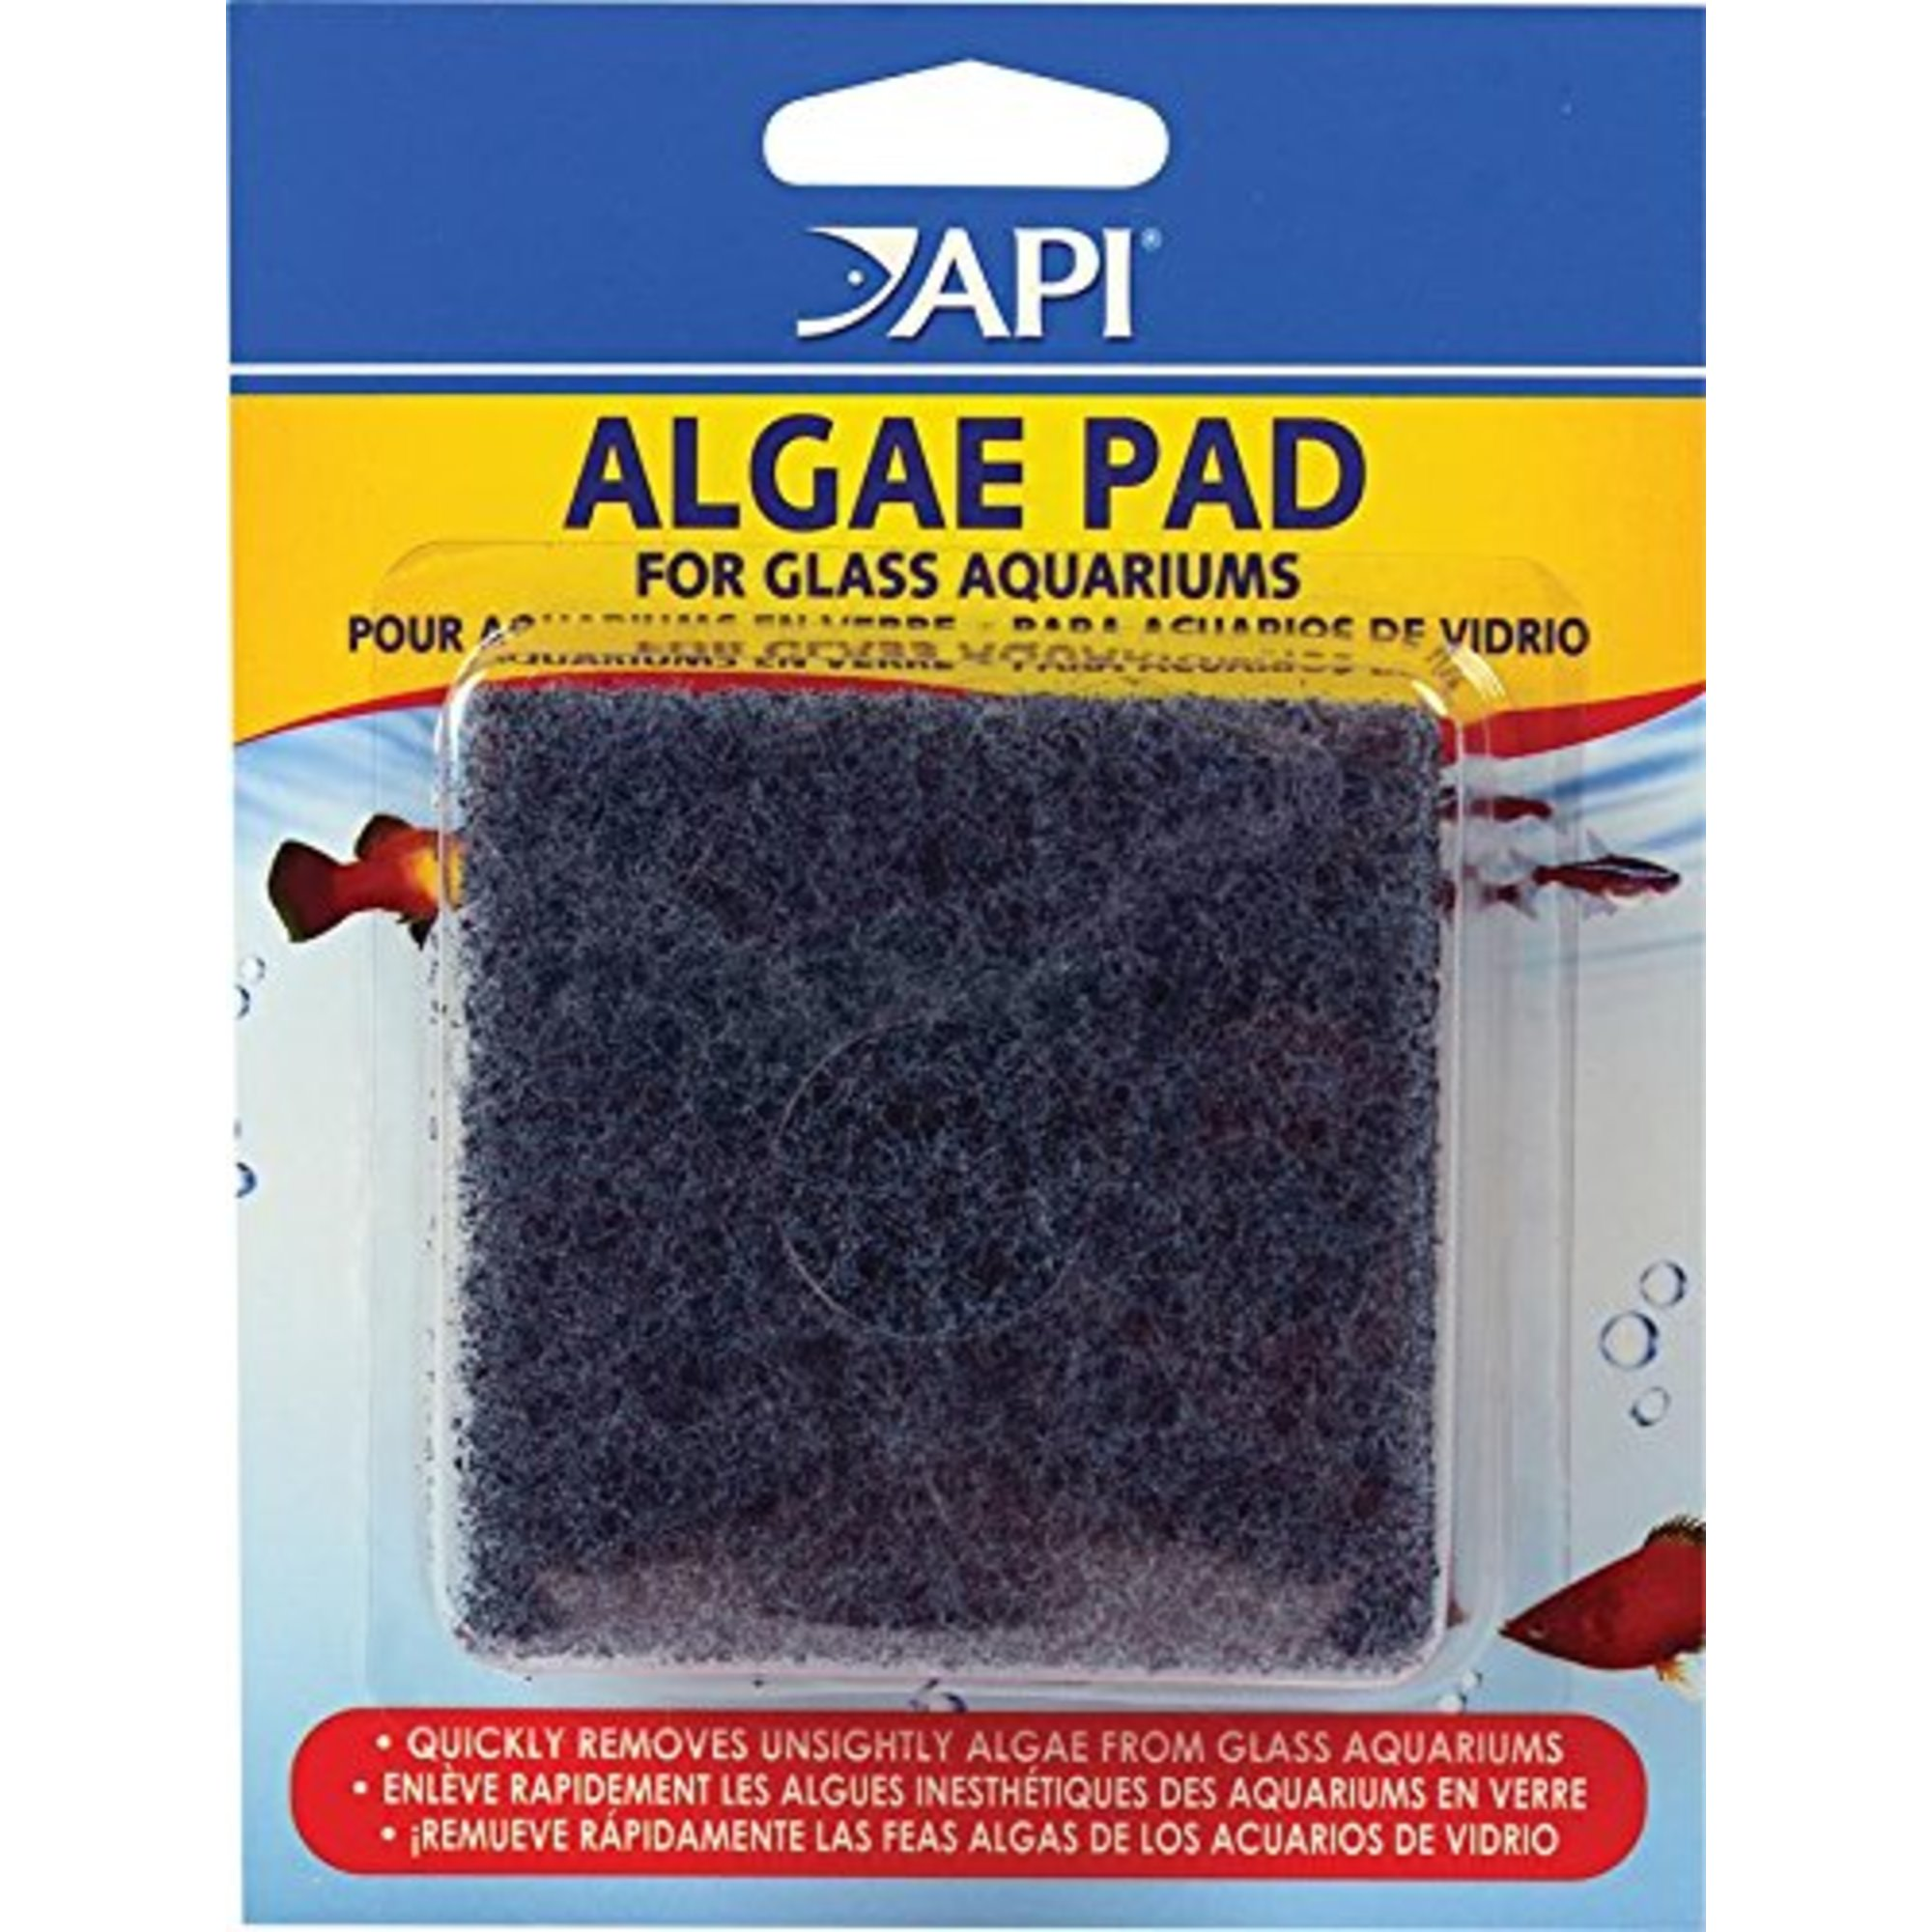 ALGAE PAD FOR GLASS AQUARIUMS